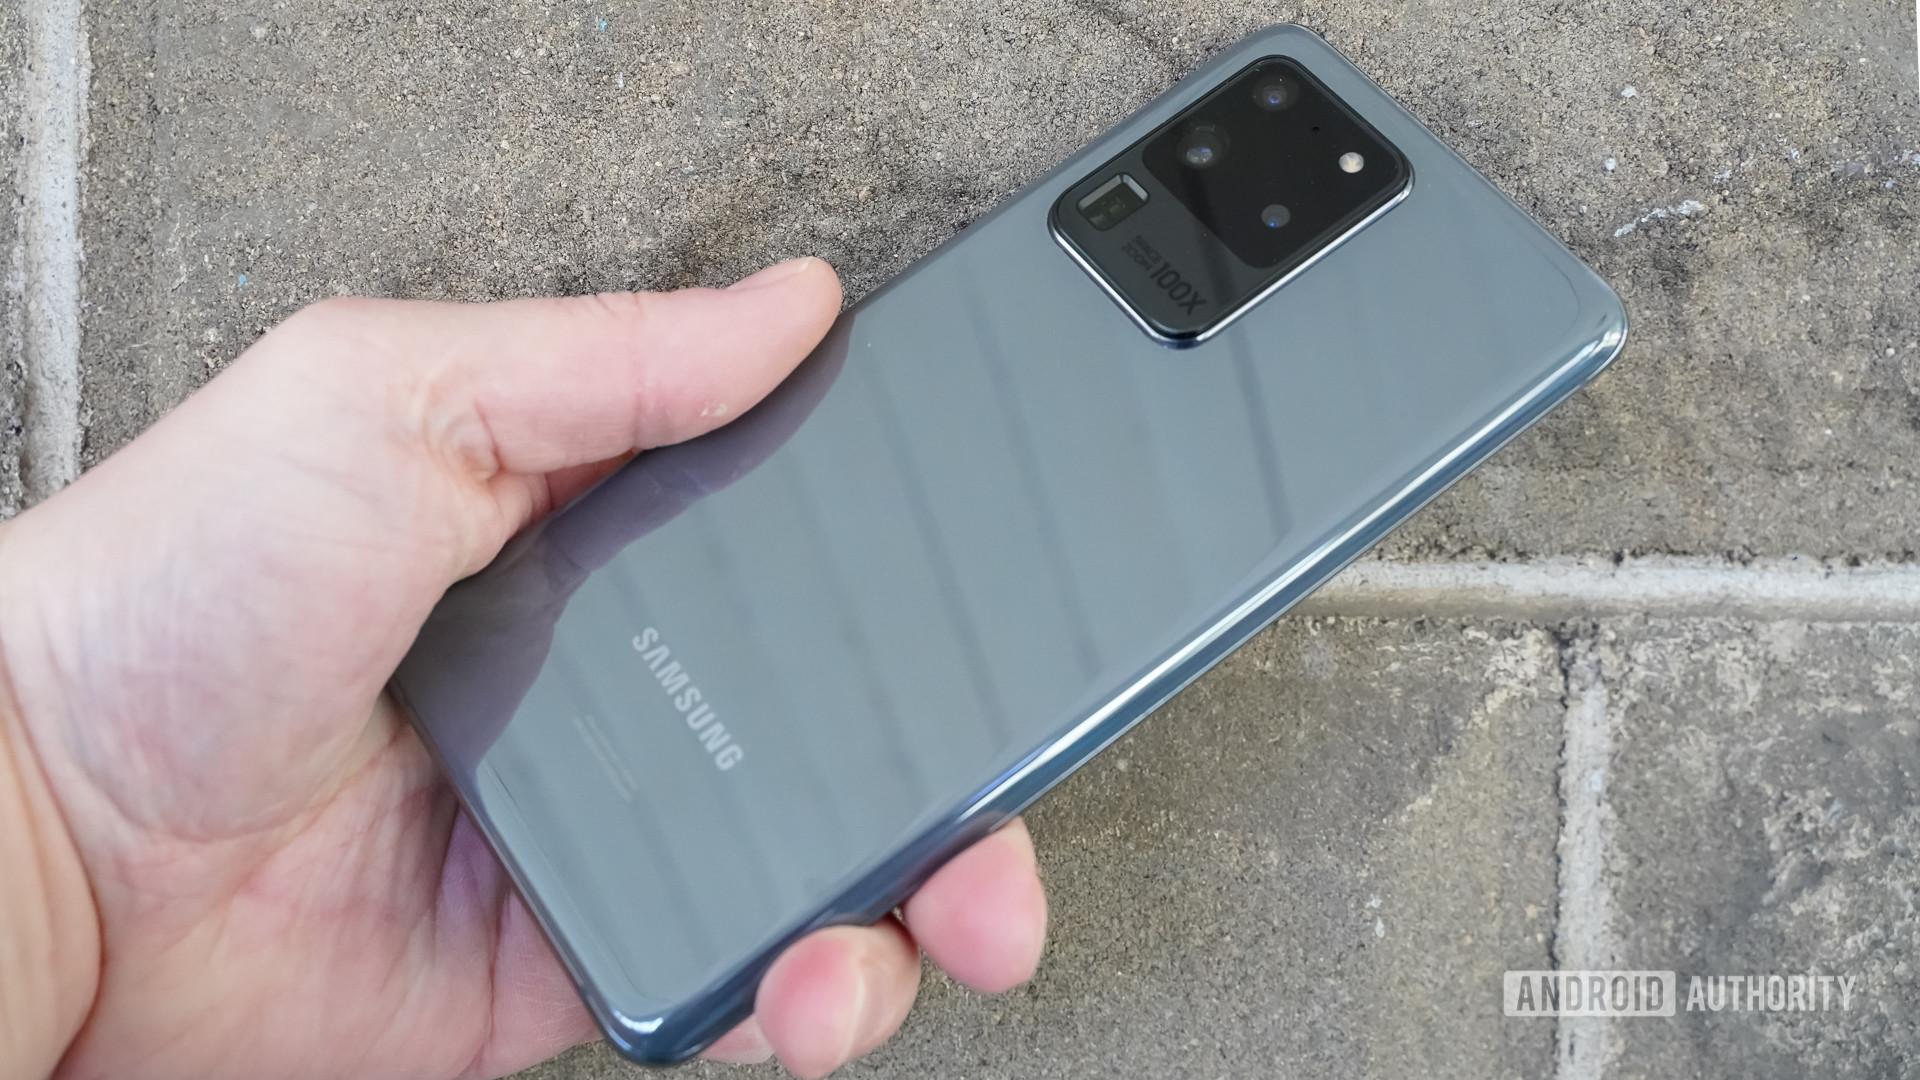 Samsung Galaxy S20 Ultra rear profile